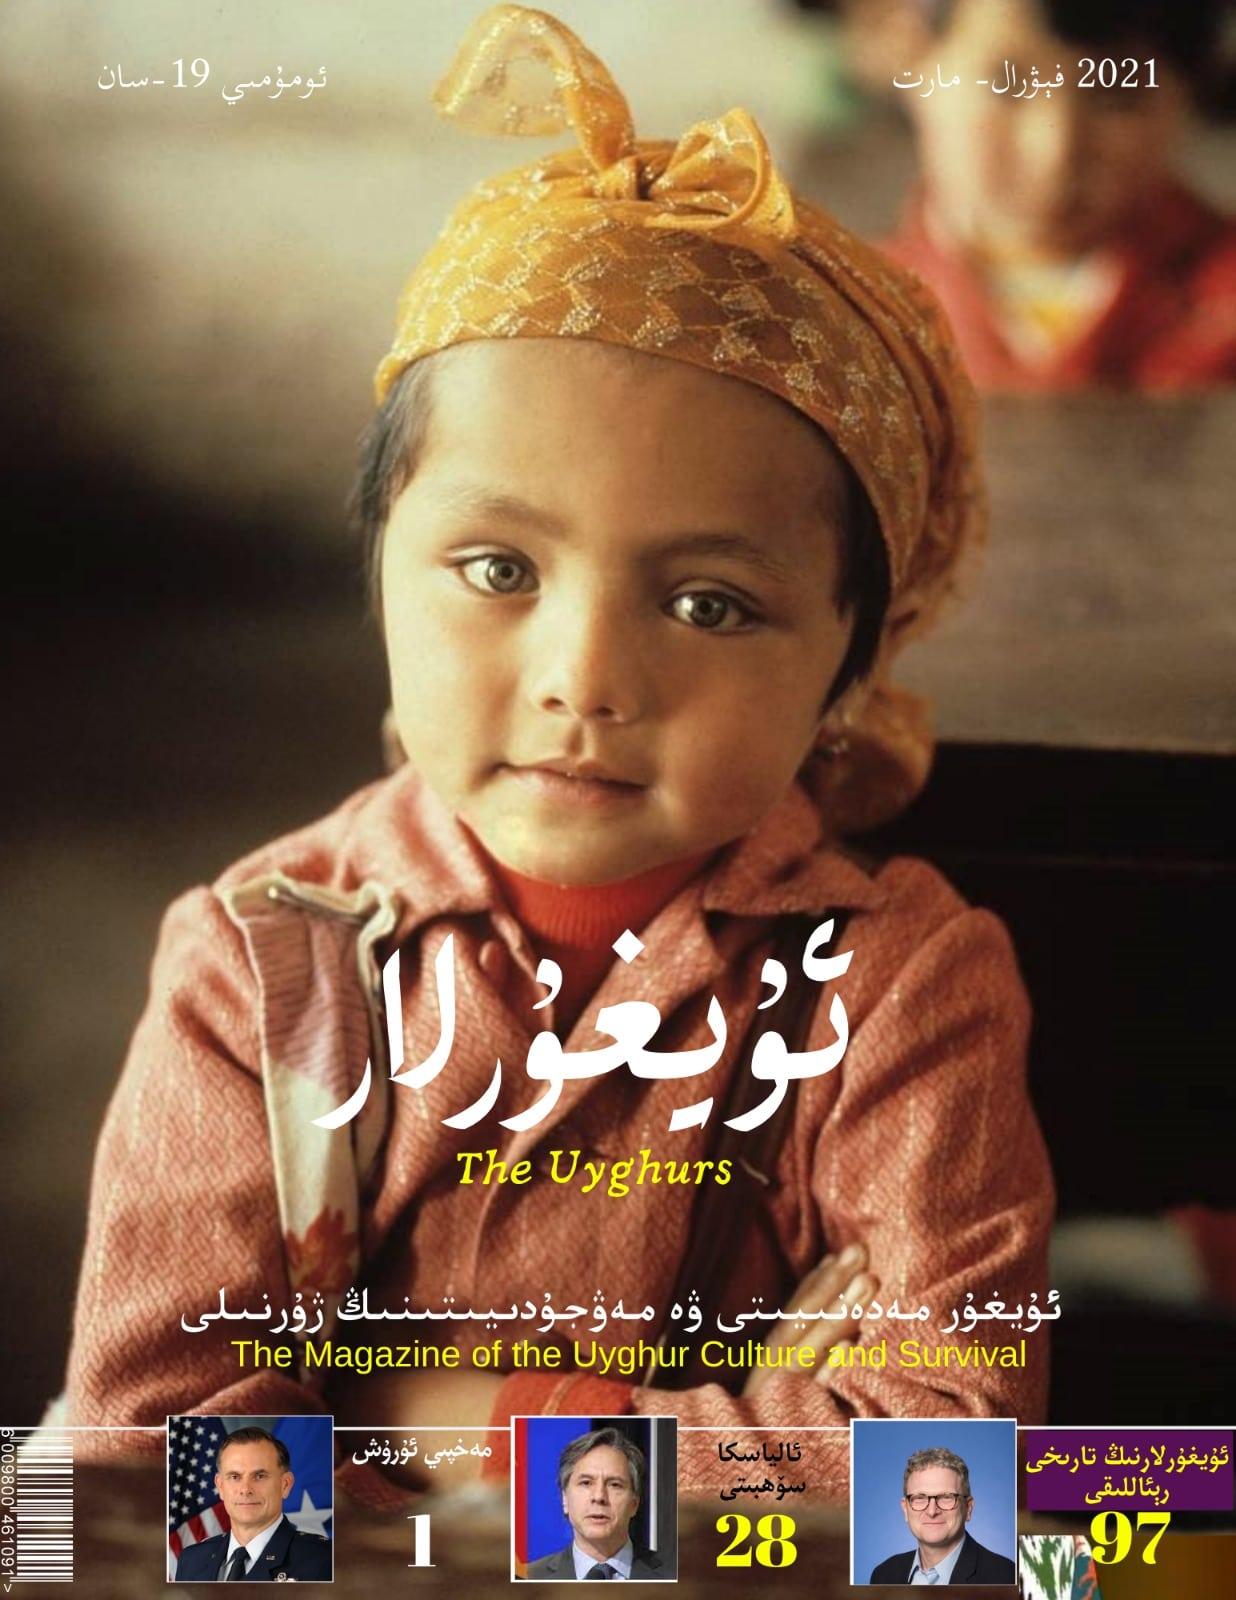 uyghur19 - ئۇيغۇرلار 2021 فېۋرال-مارت ئومۇمىي 19-سان